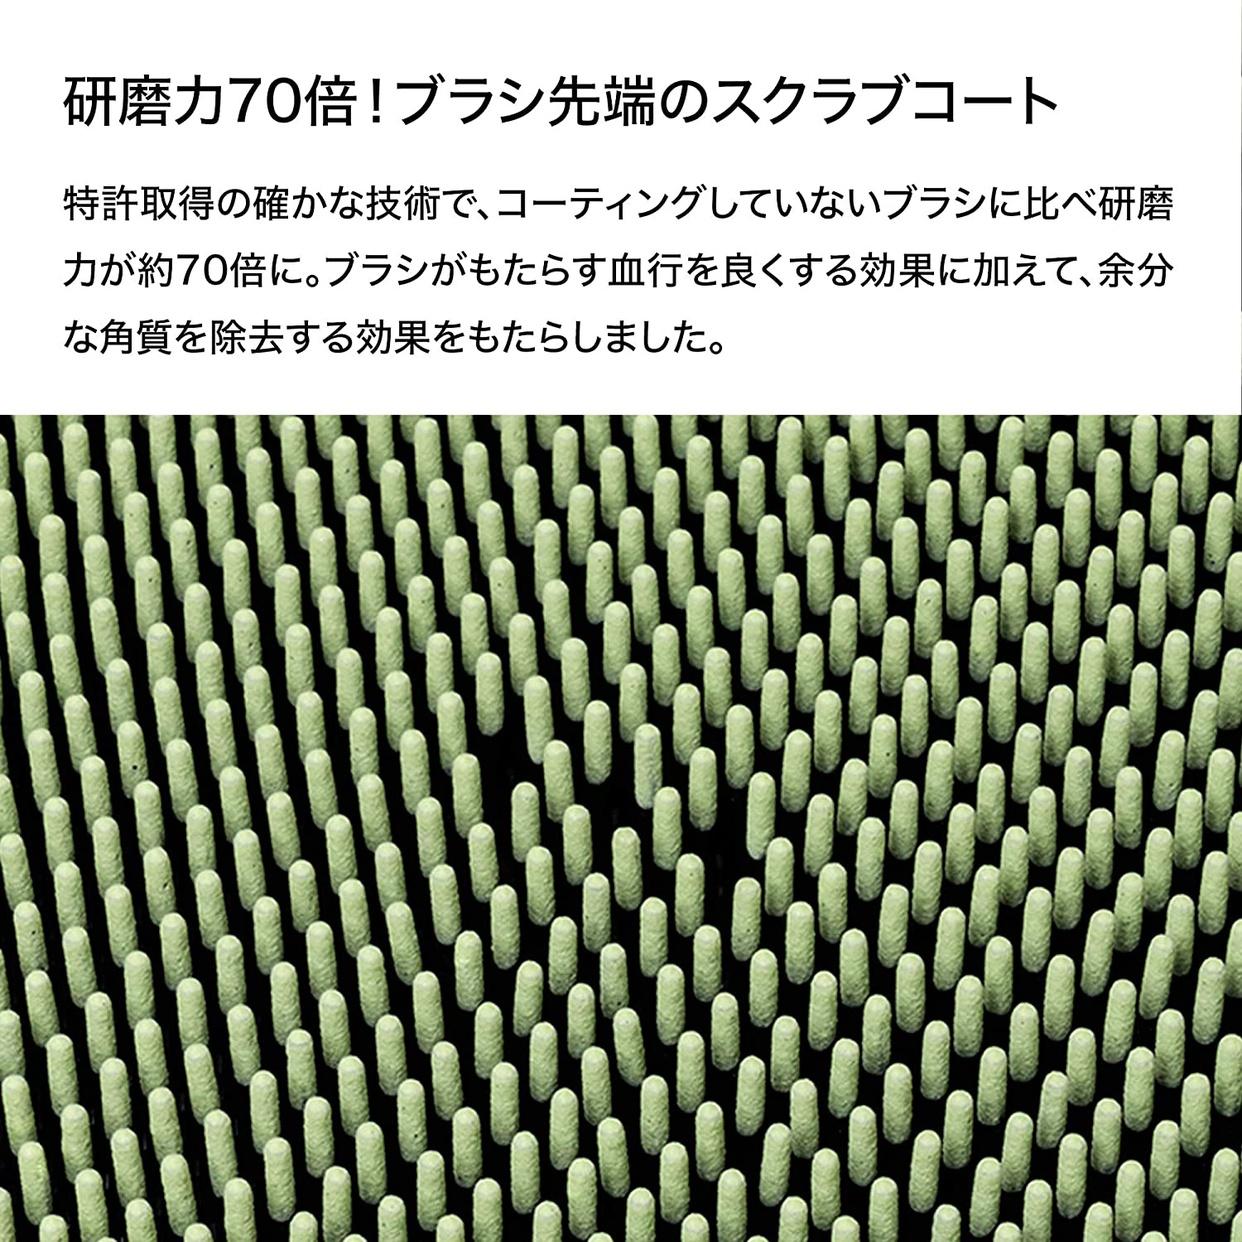 Sunpac(サンパック) フットグルーマーグランスポーツの商品画像6